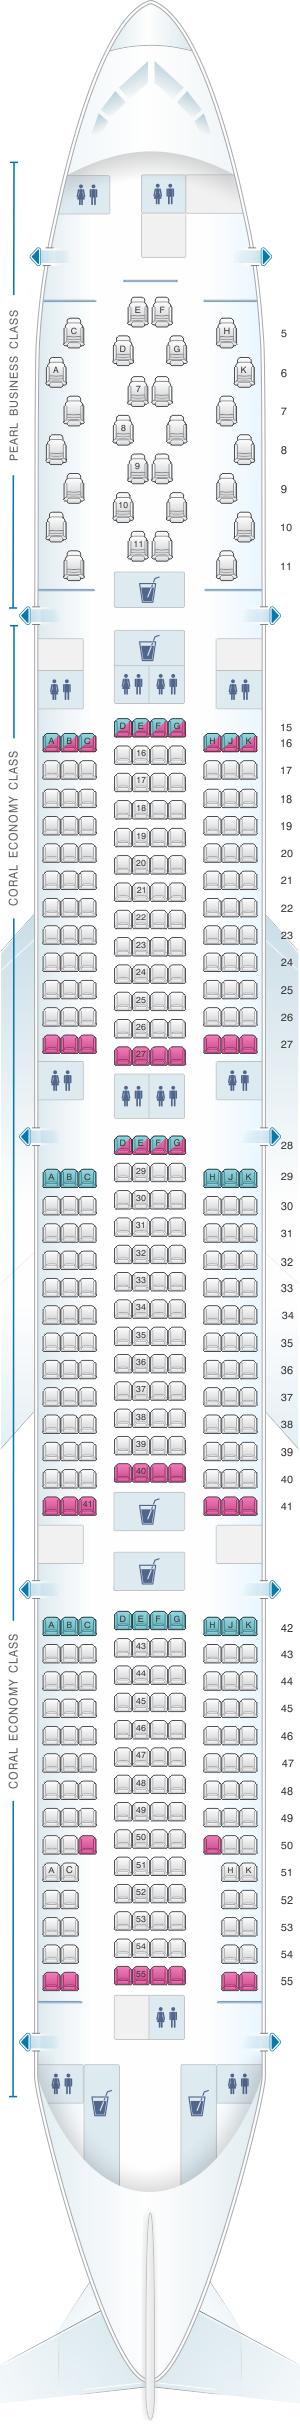 Seat map for Etihad Airways Boeing B777 300ER 2 class V1